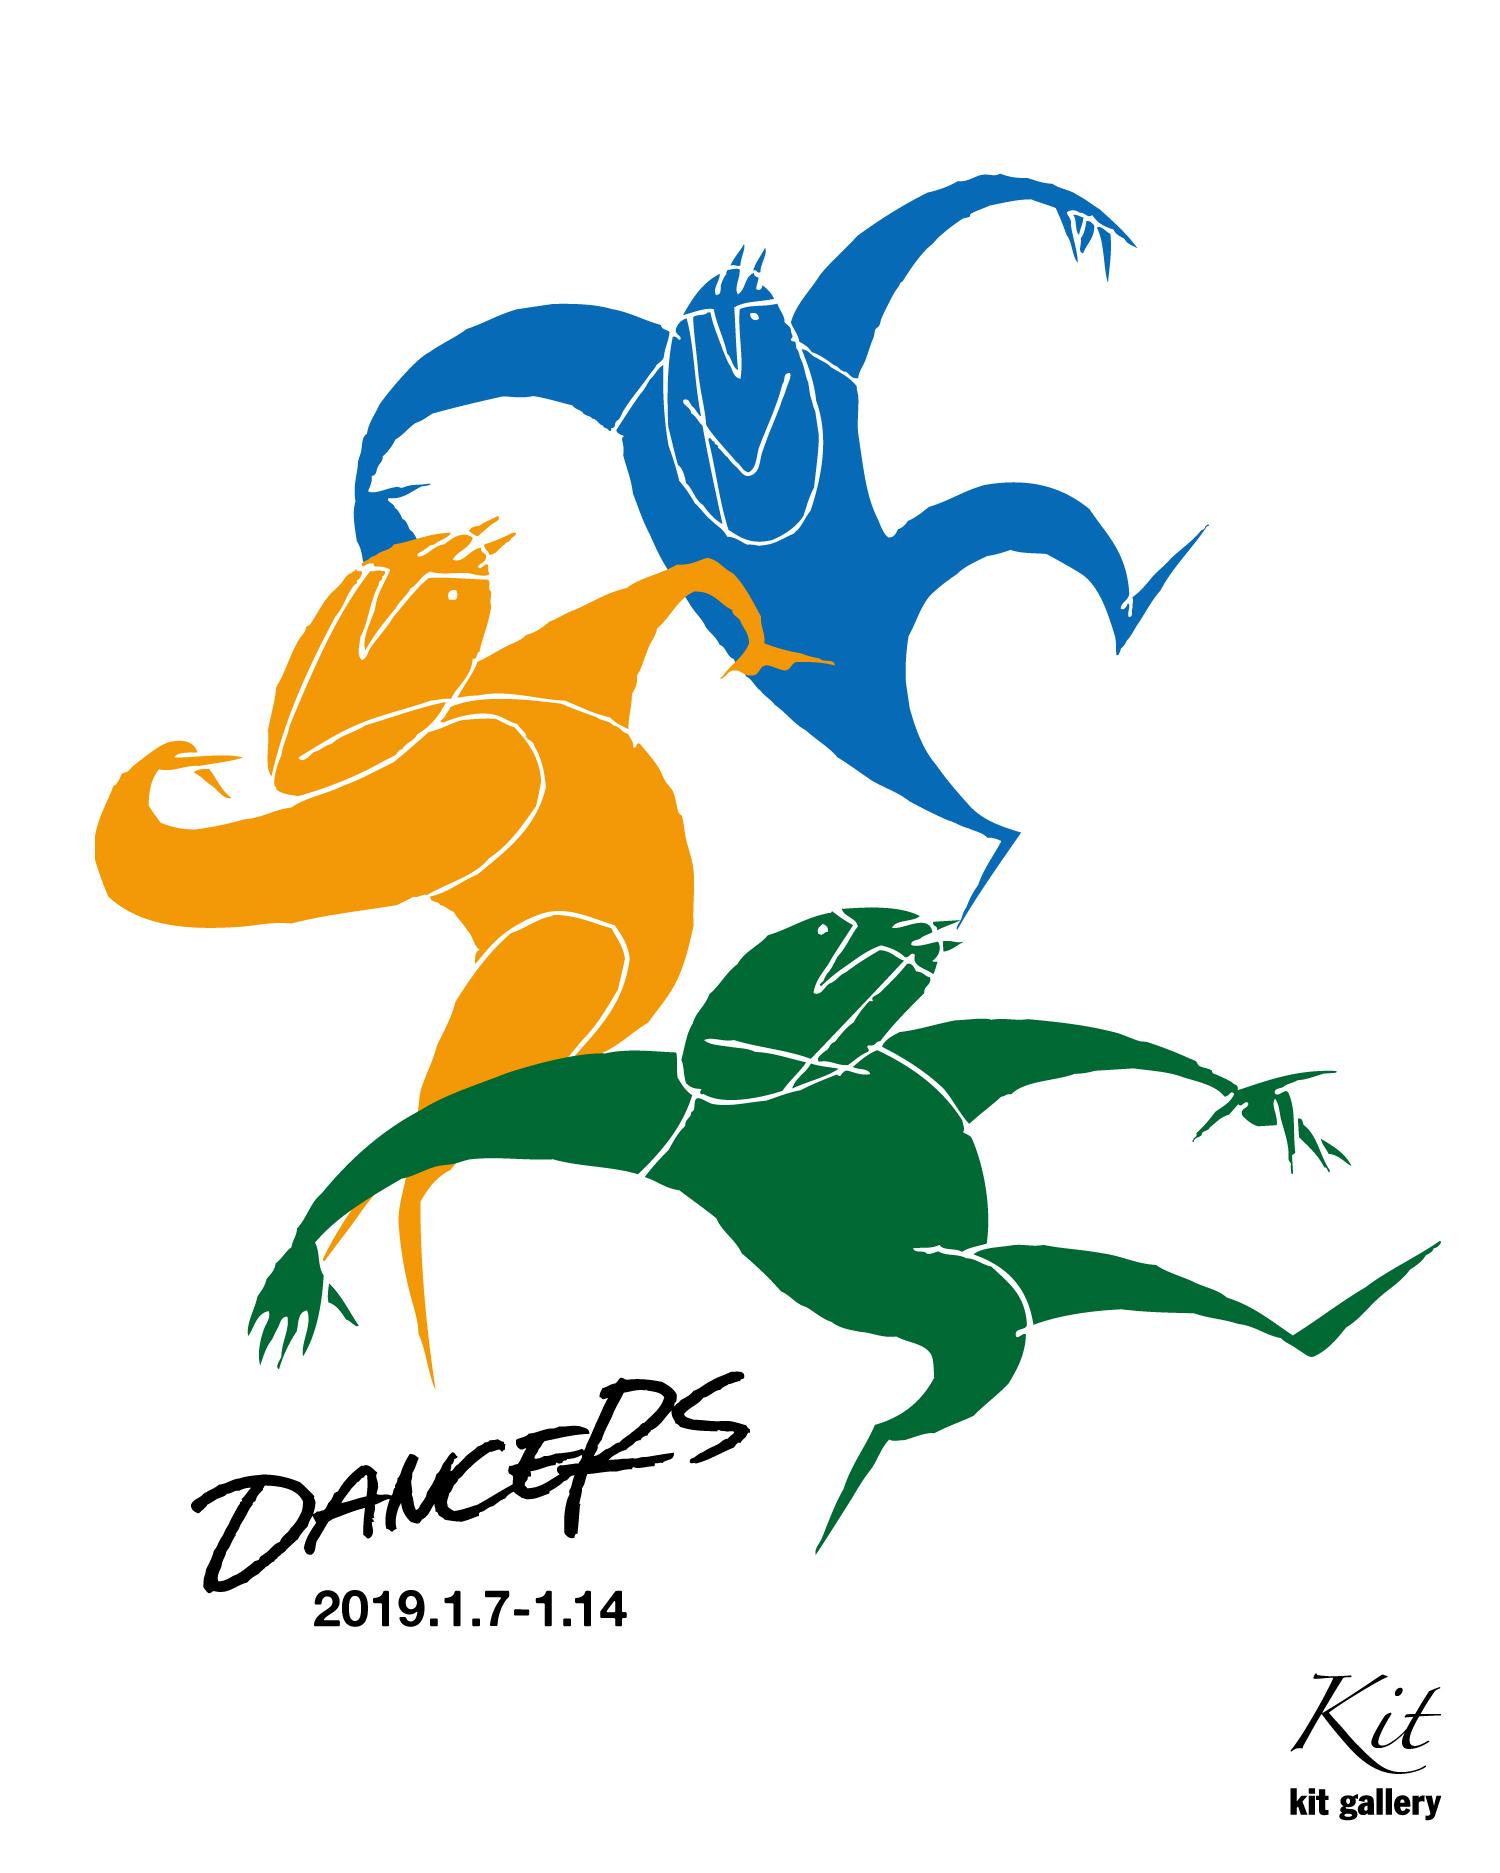 http://kit-gallery.com/schedule/files/DANCERS.jpg